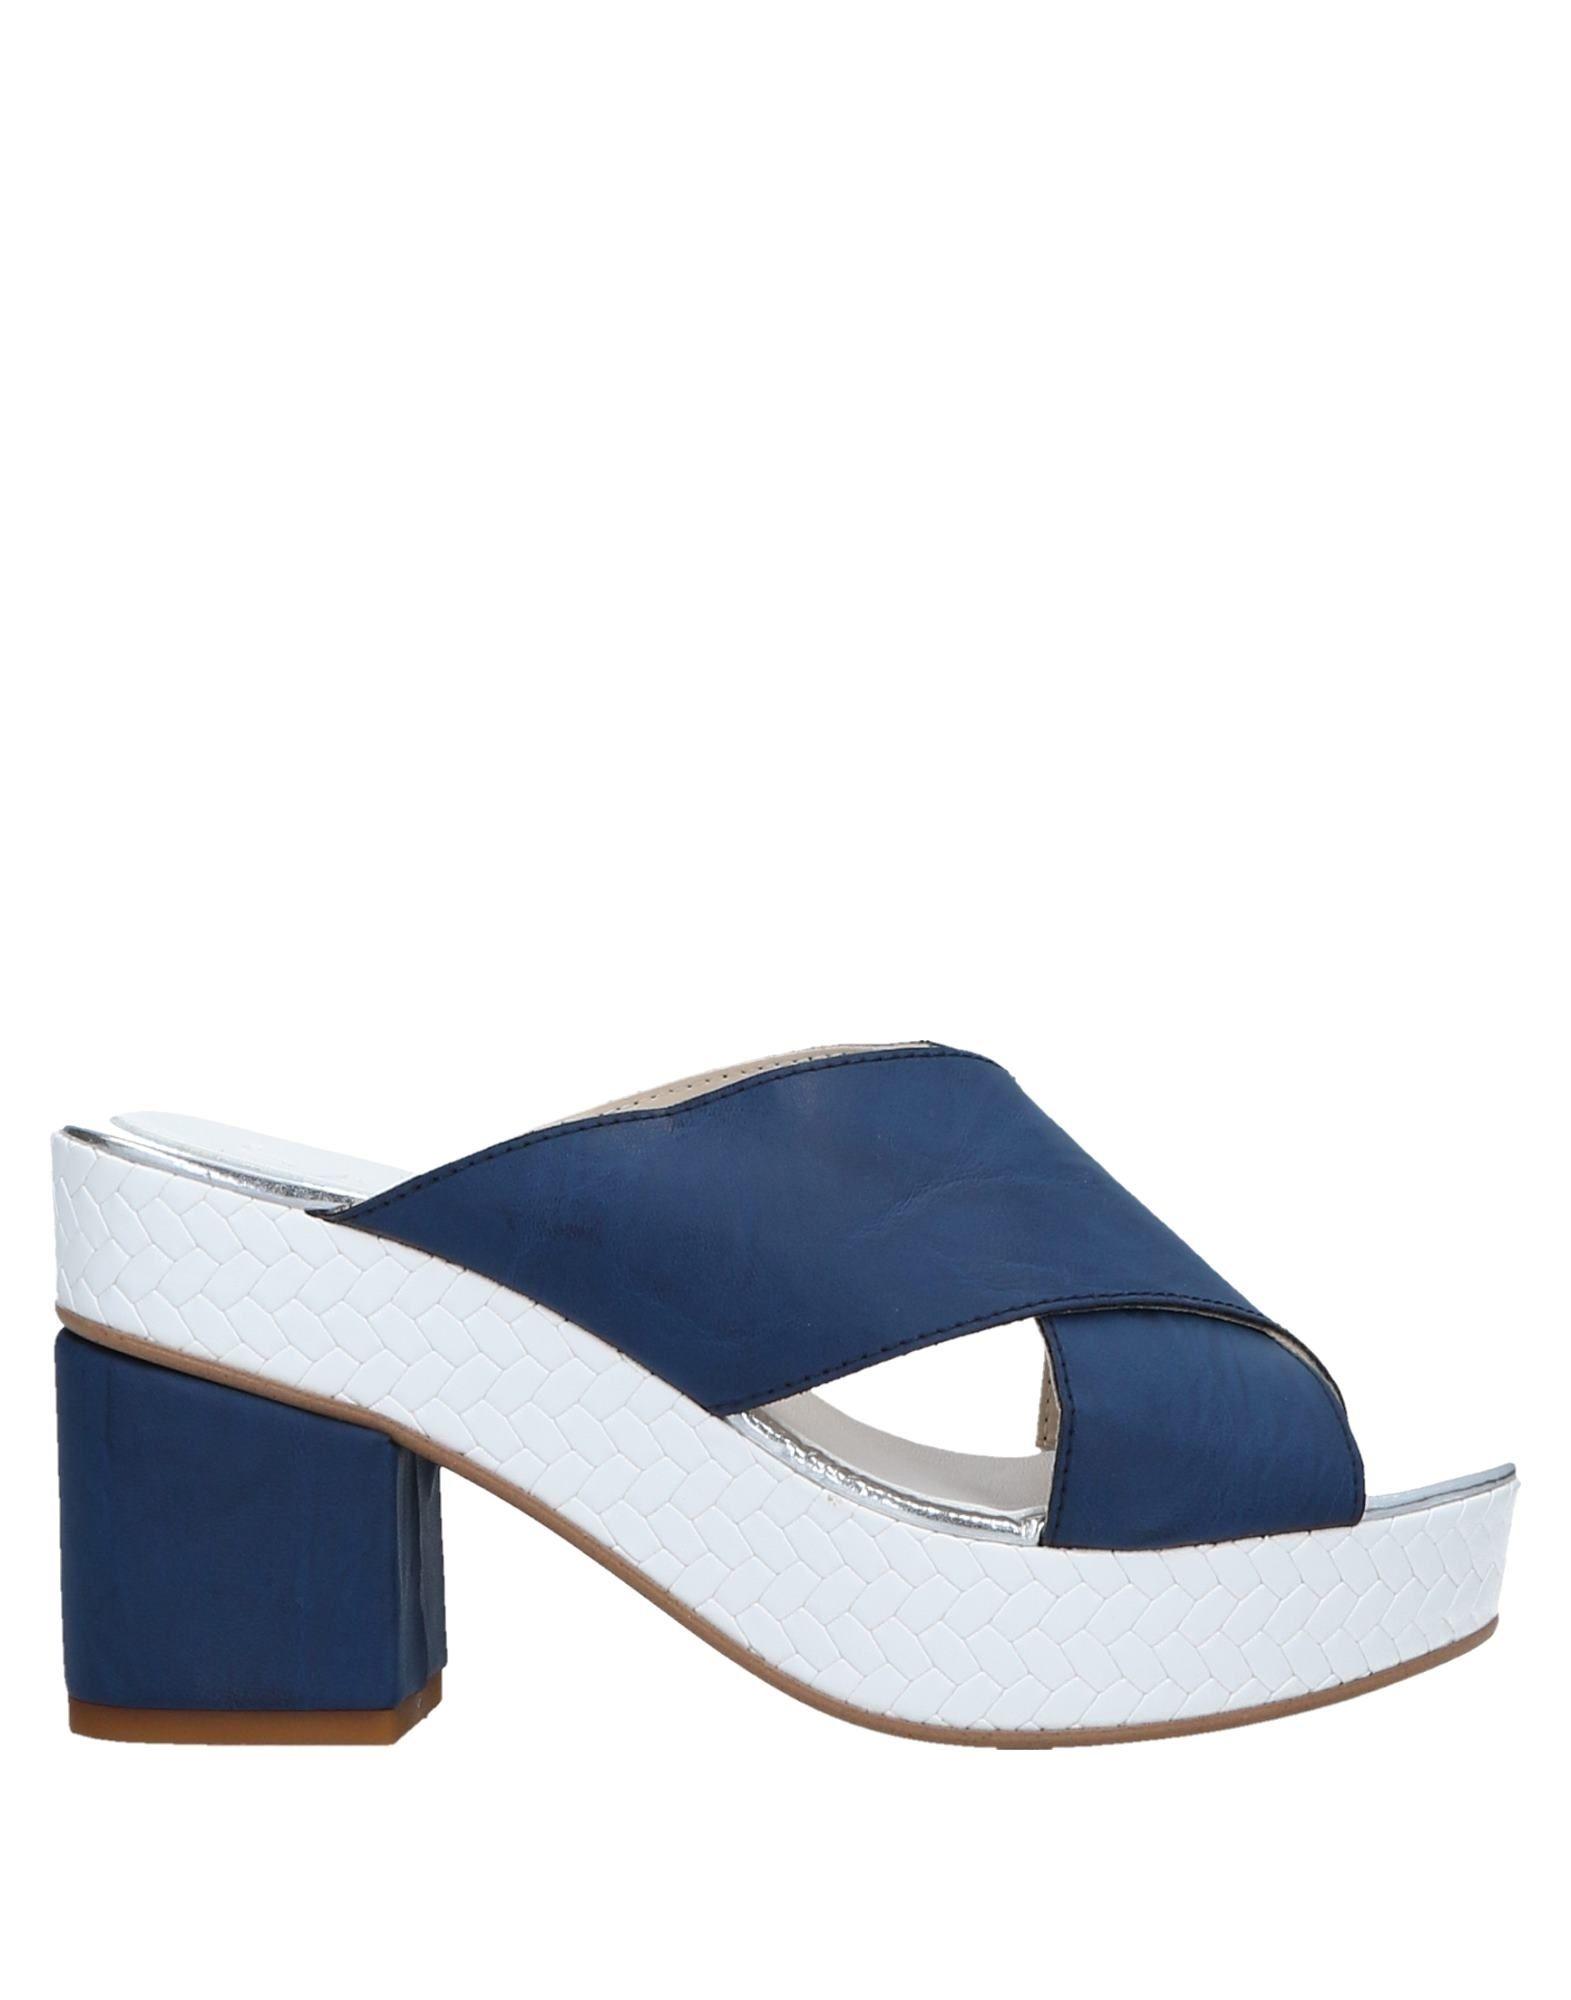 Sara Sandalen Damen  11499741PI 11499741PI 11499741PI Gute Qualität beliebte Schuhe 72a168